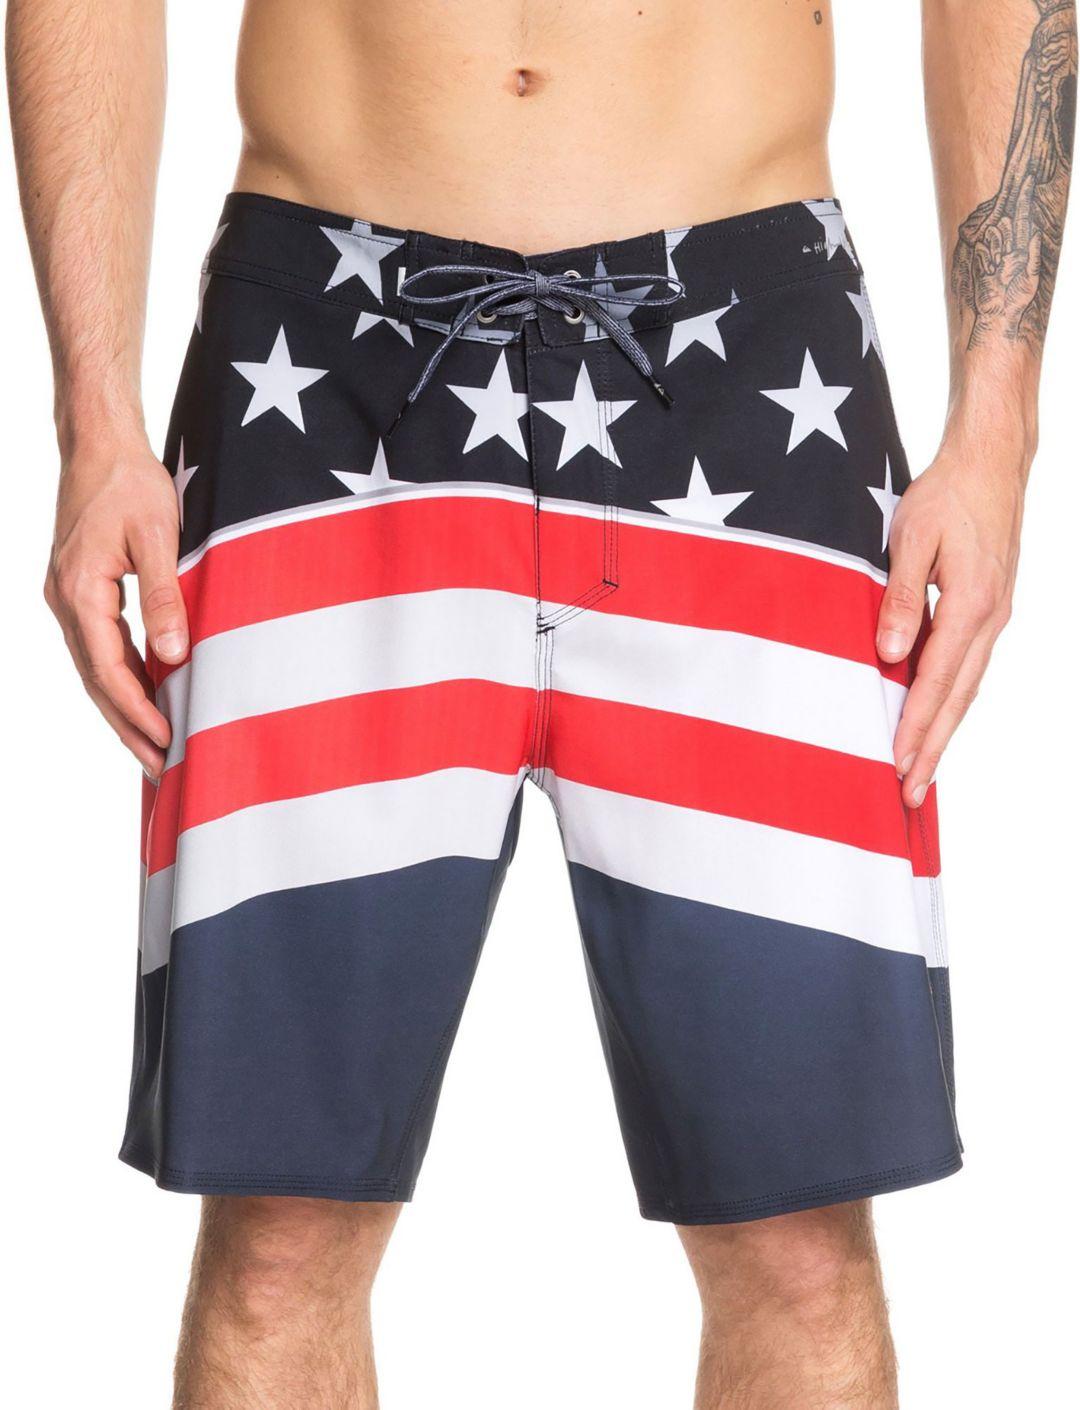 56408b9c9e Quiksilver Men's Highline Freedom Board Shorts | DICK'S Sporting Goods